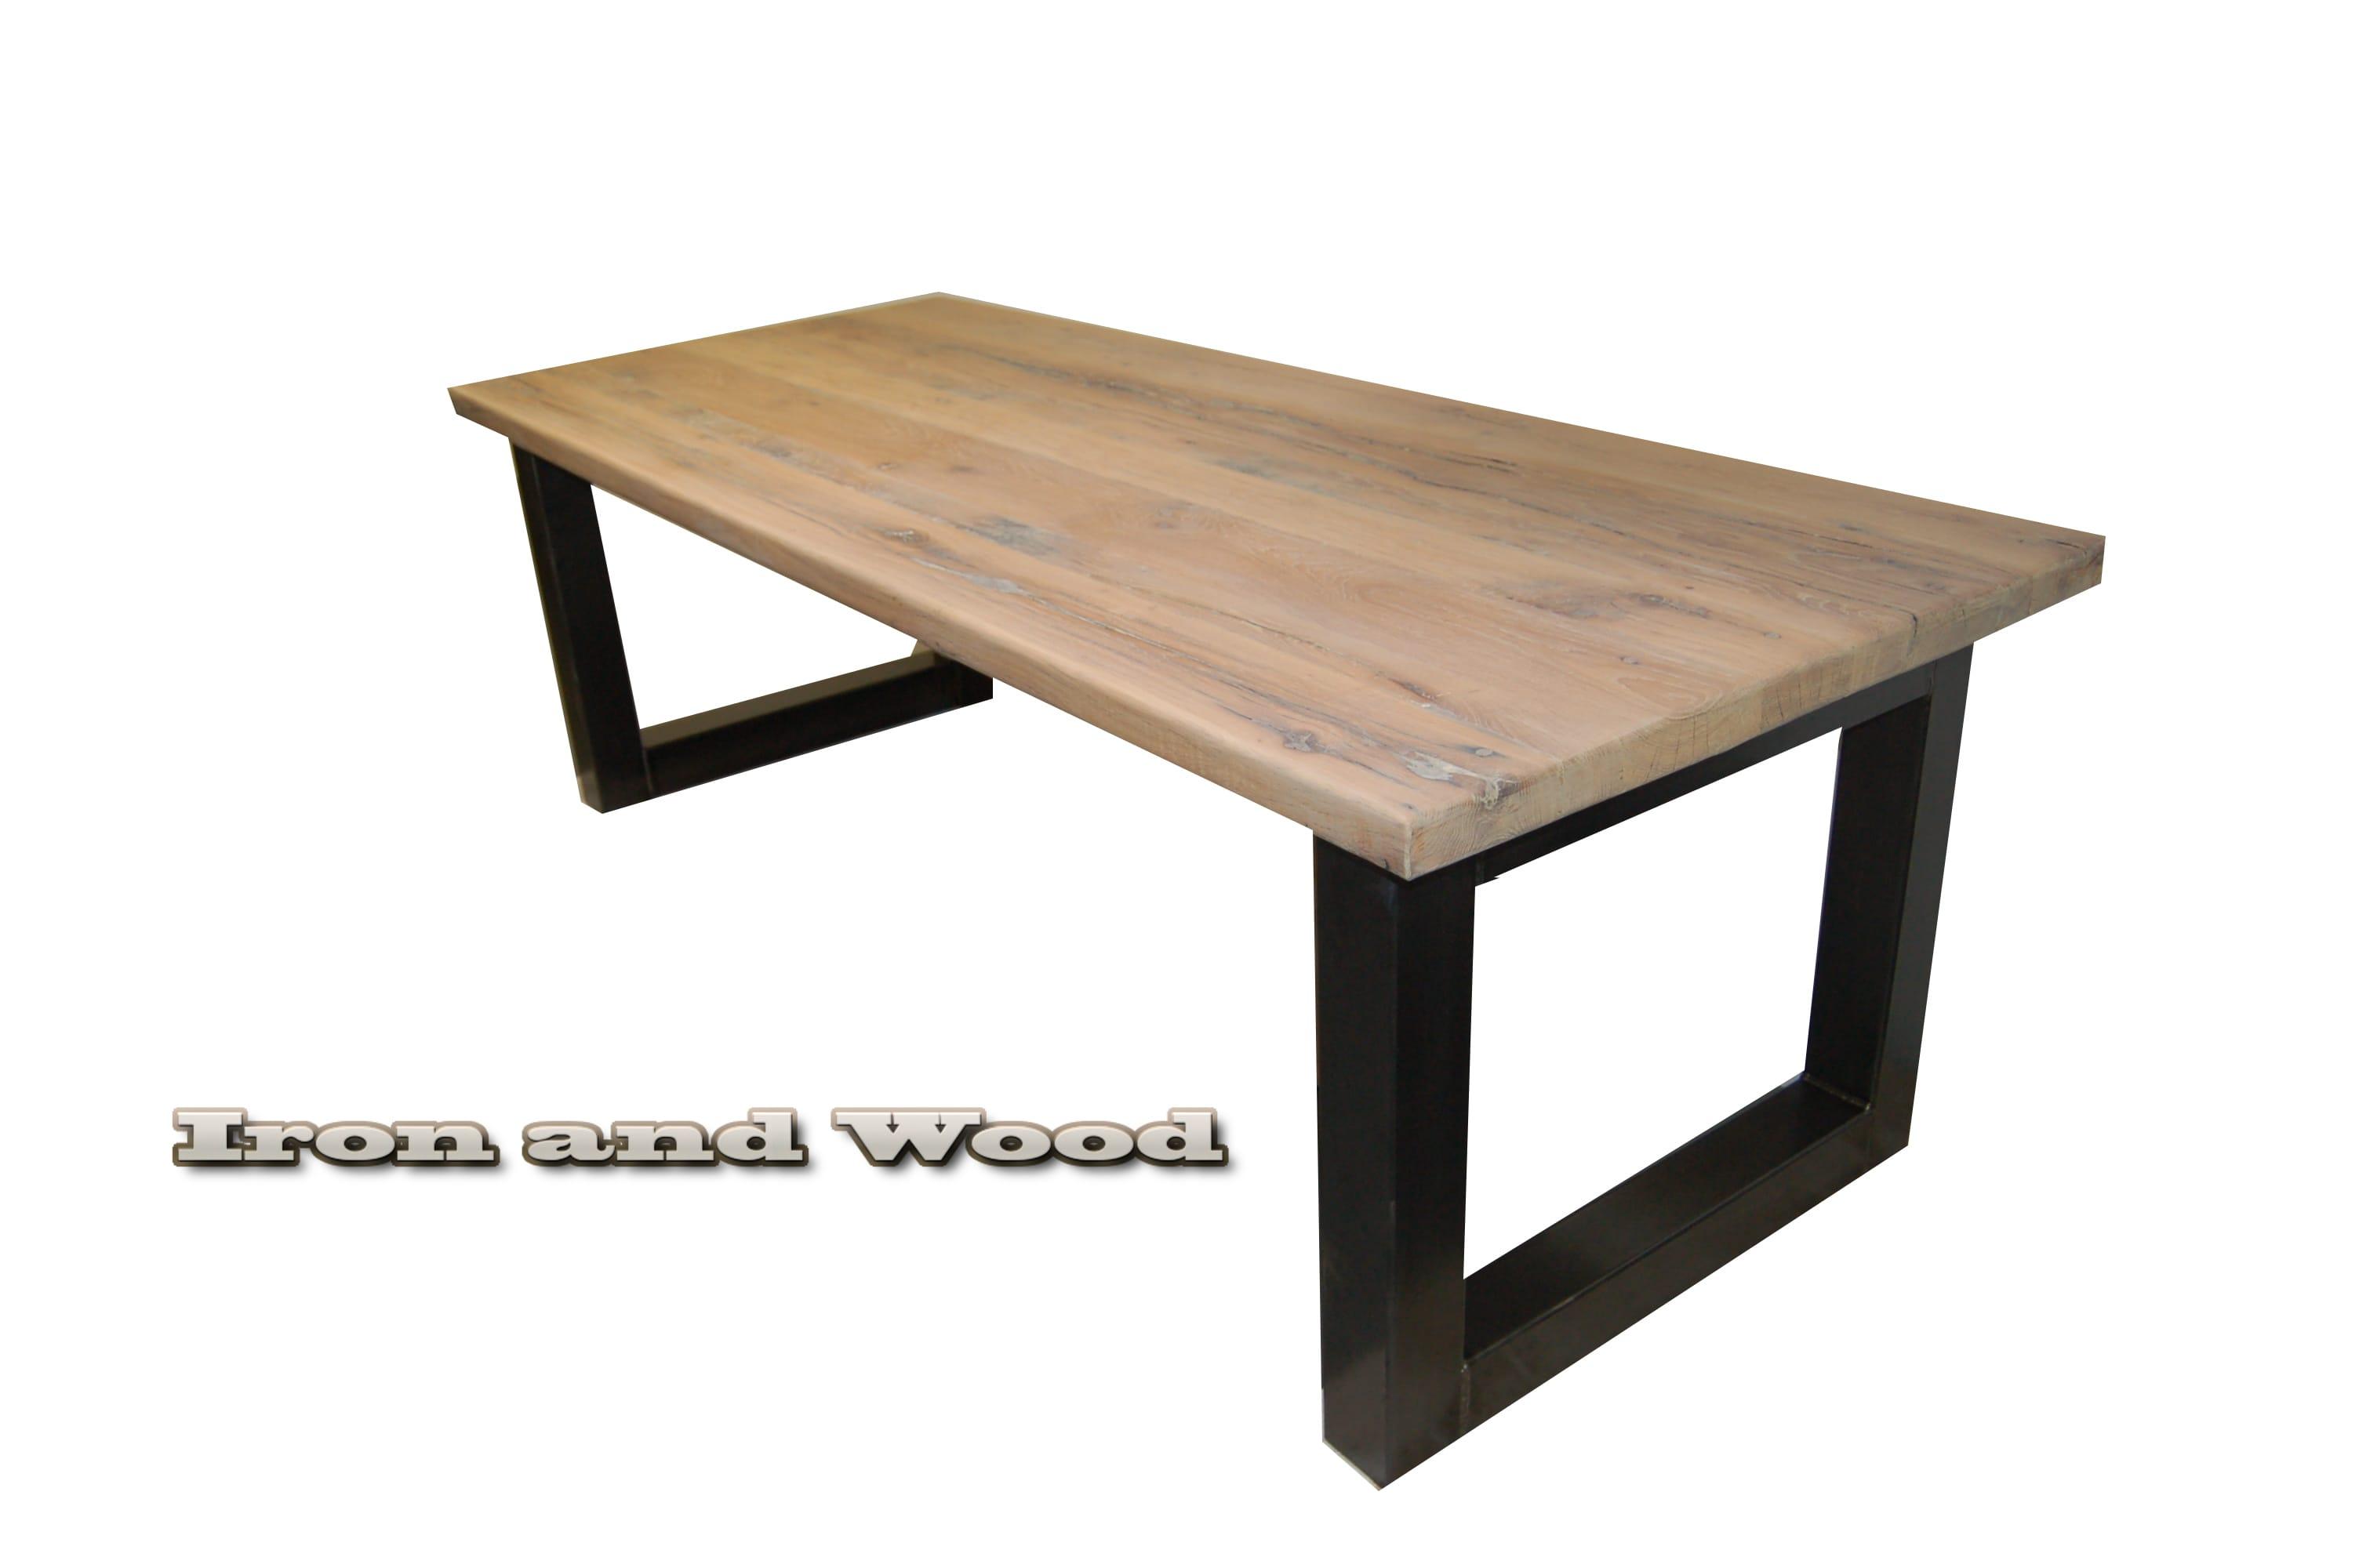 Industriele Tafel Goedkoop : Industriele tafel goedkoop goedkope industriele meubels industrile